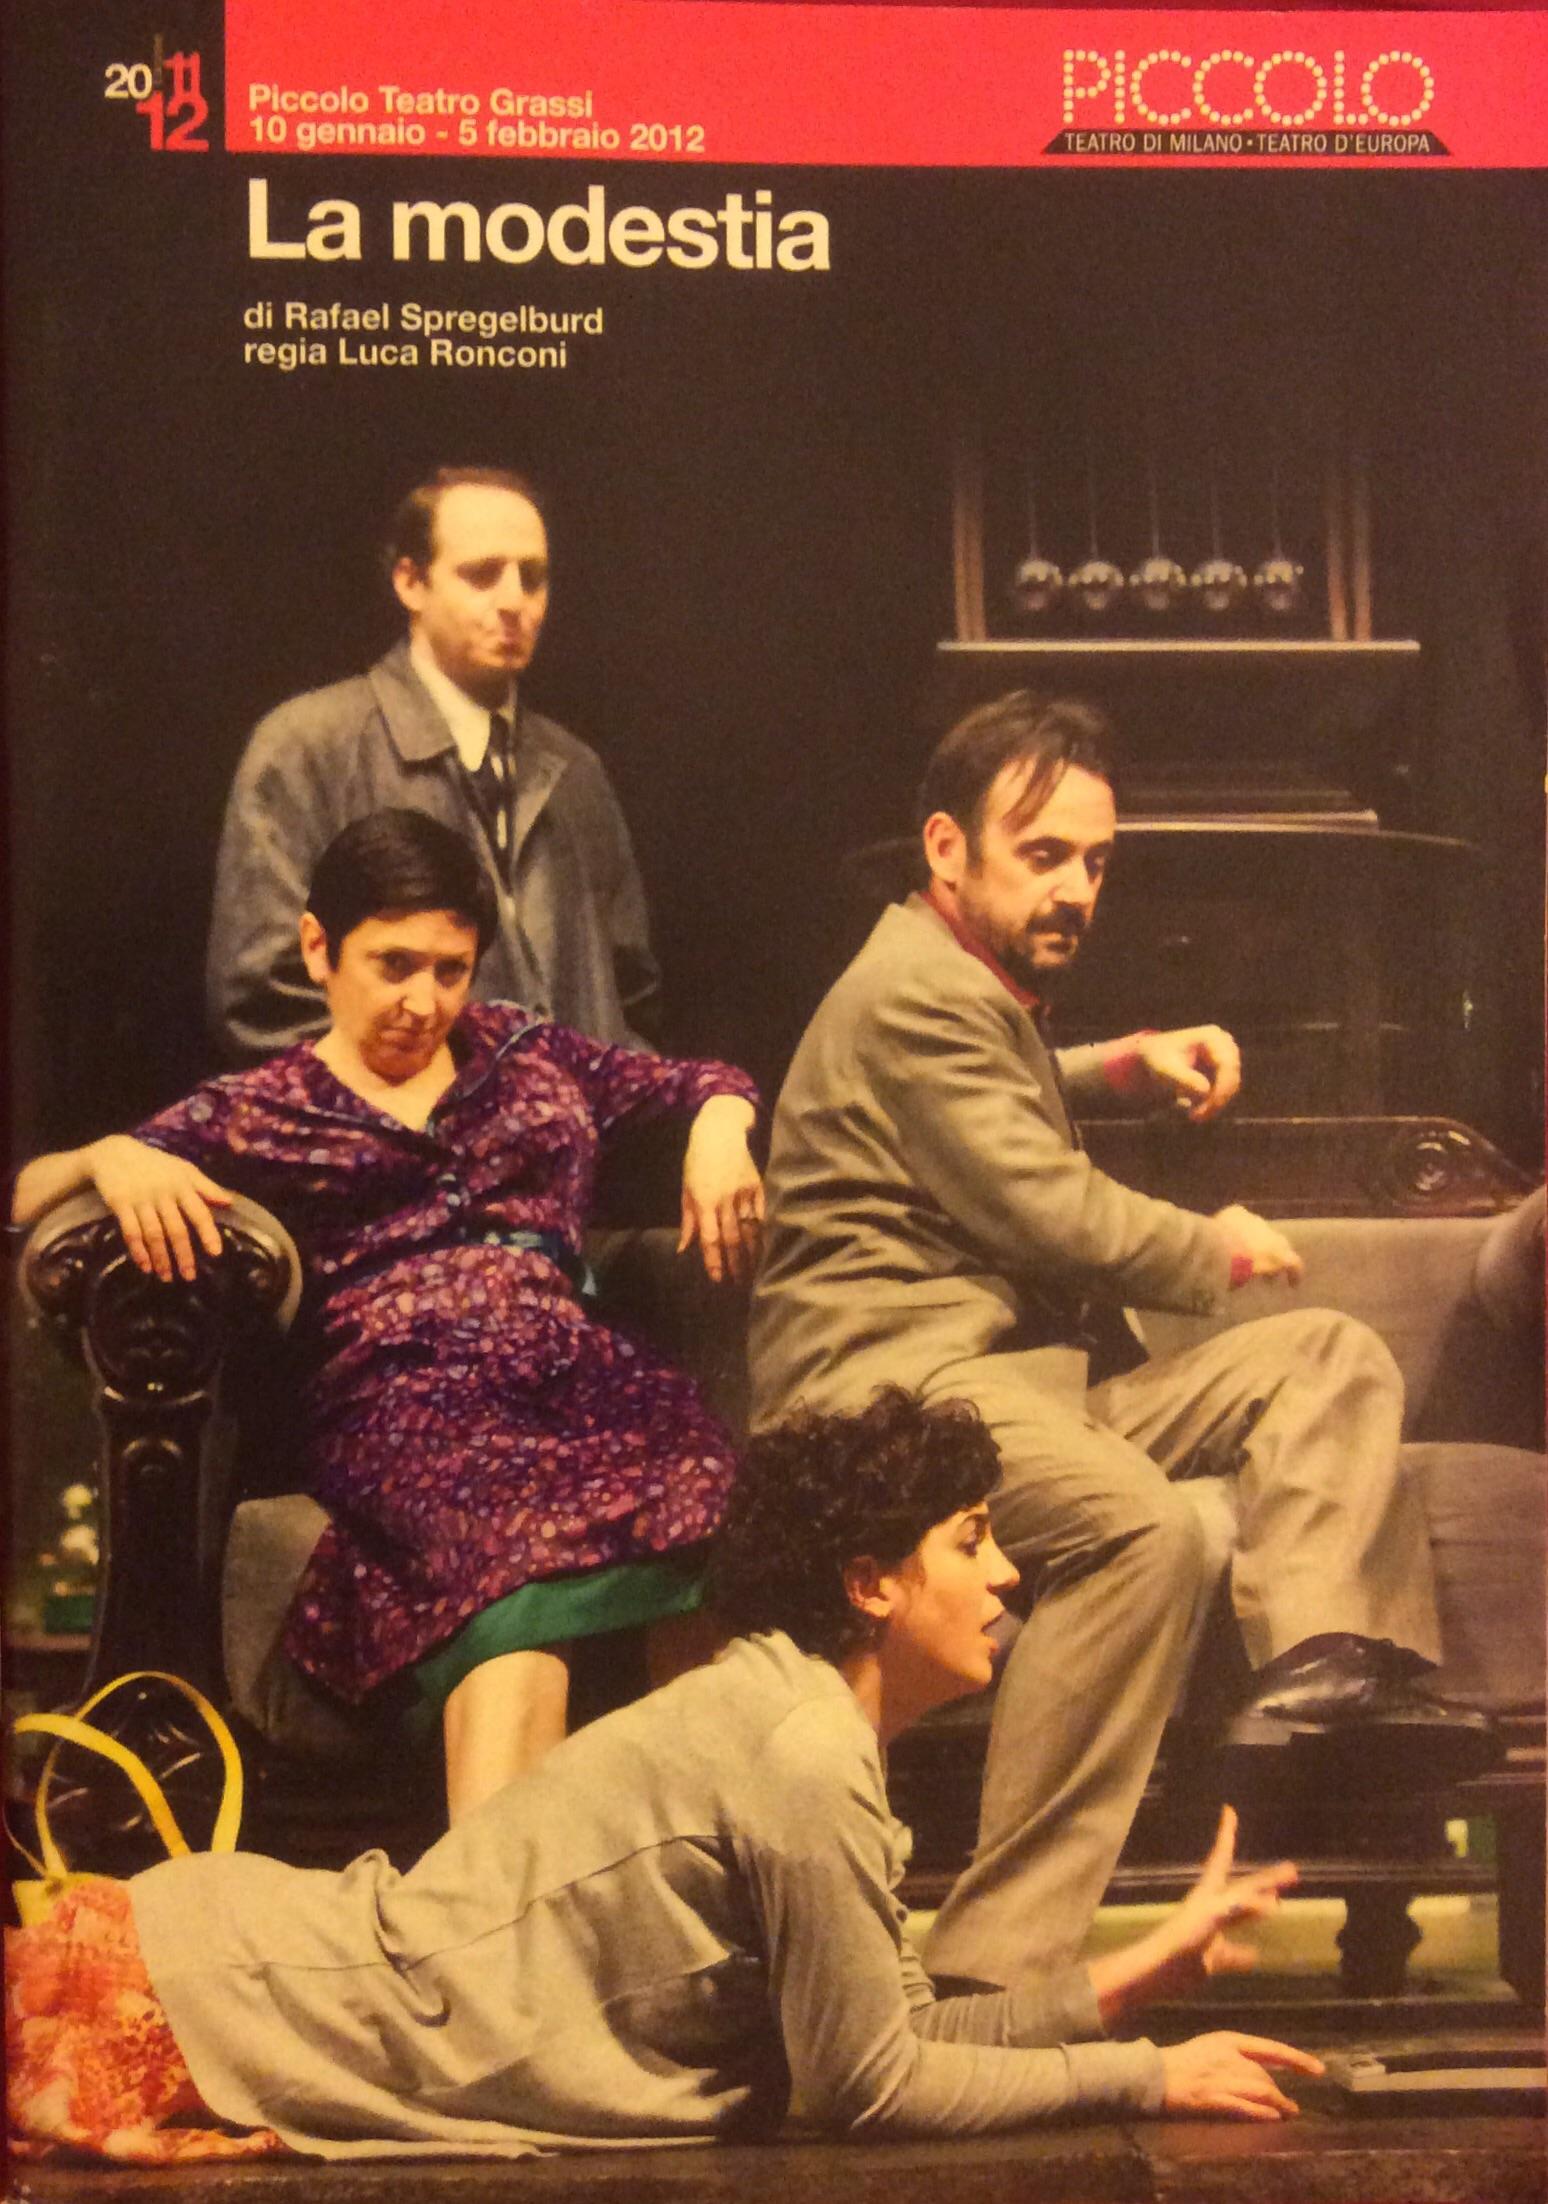 La modestia di Rafael Spregelburd, regia Luca Ronconi